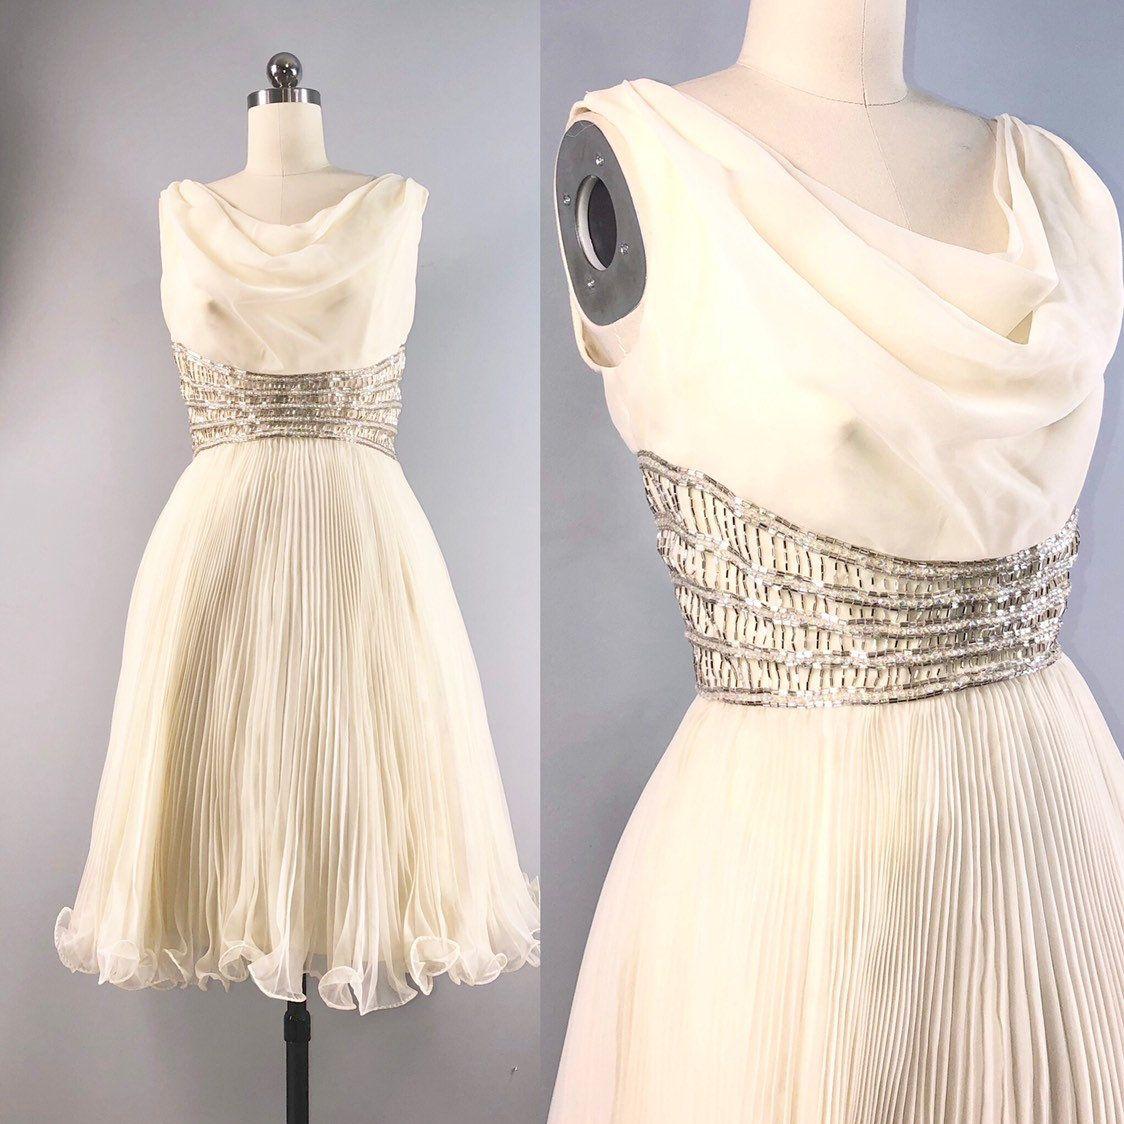 Jack Bryan 60s Dress Vintage 1960s Ivory White Pleated Beaded Etsy 60s Dress Vintage Pleated Dress Pattern Dresses [ 1124 x 1124 Pixel ]